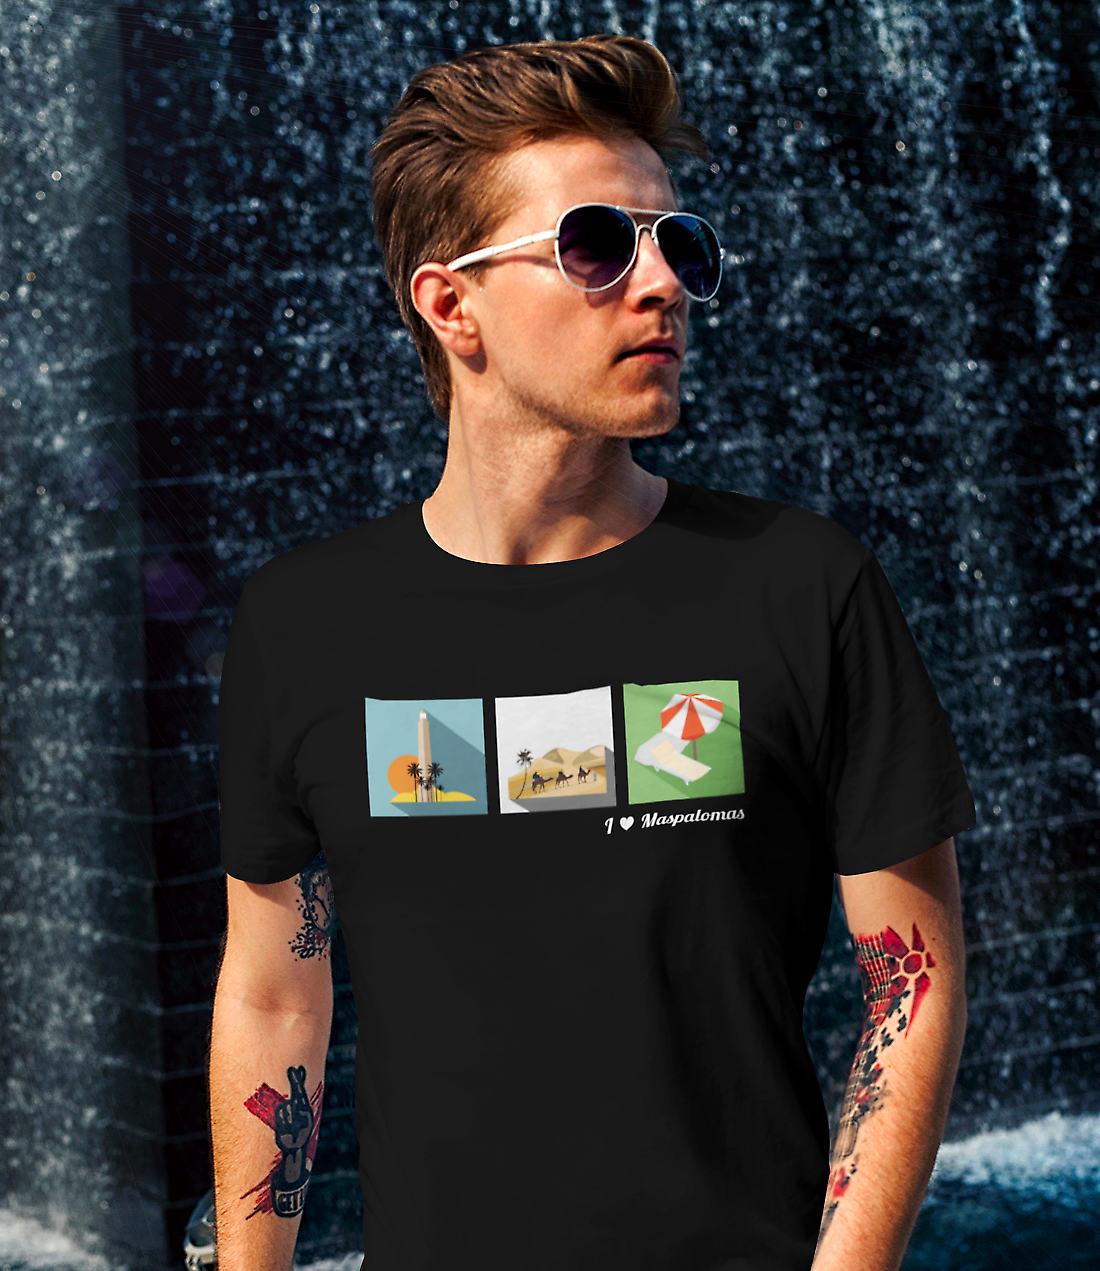 Slide-Gran-Canaria-T-Shirt-Maspalomas-3-Pictos